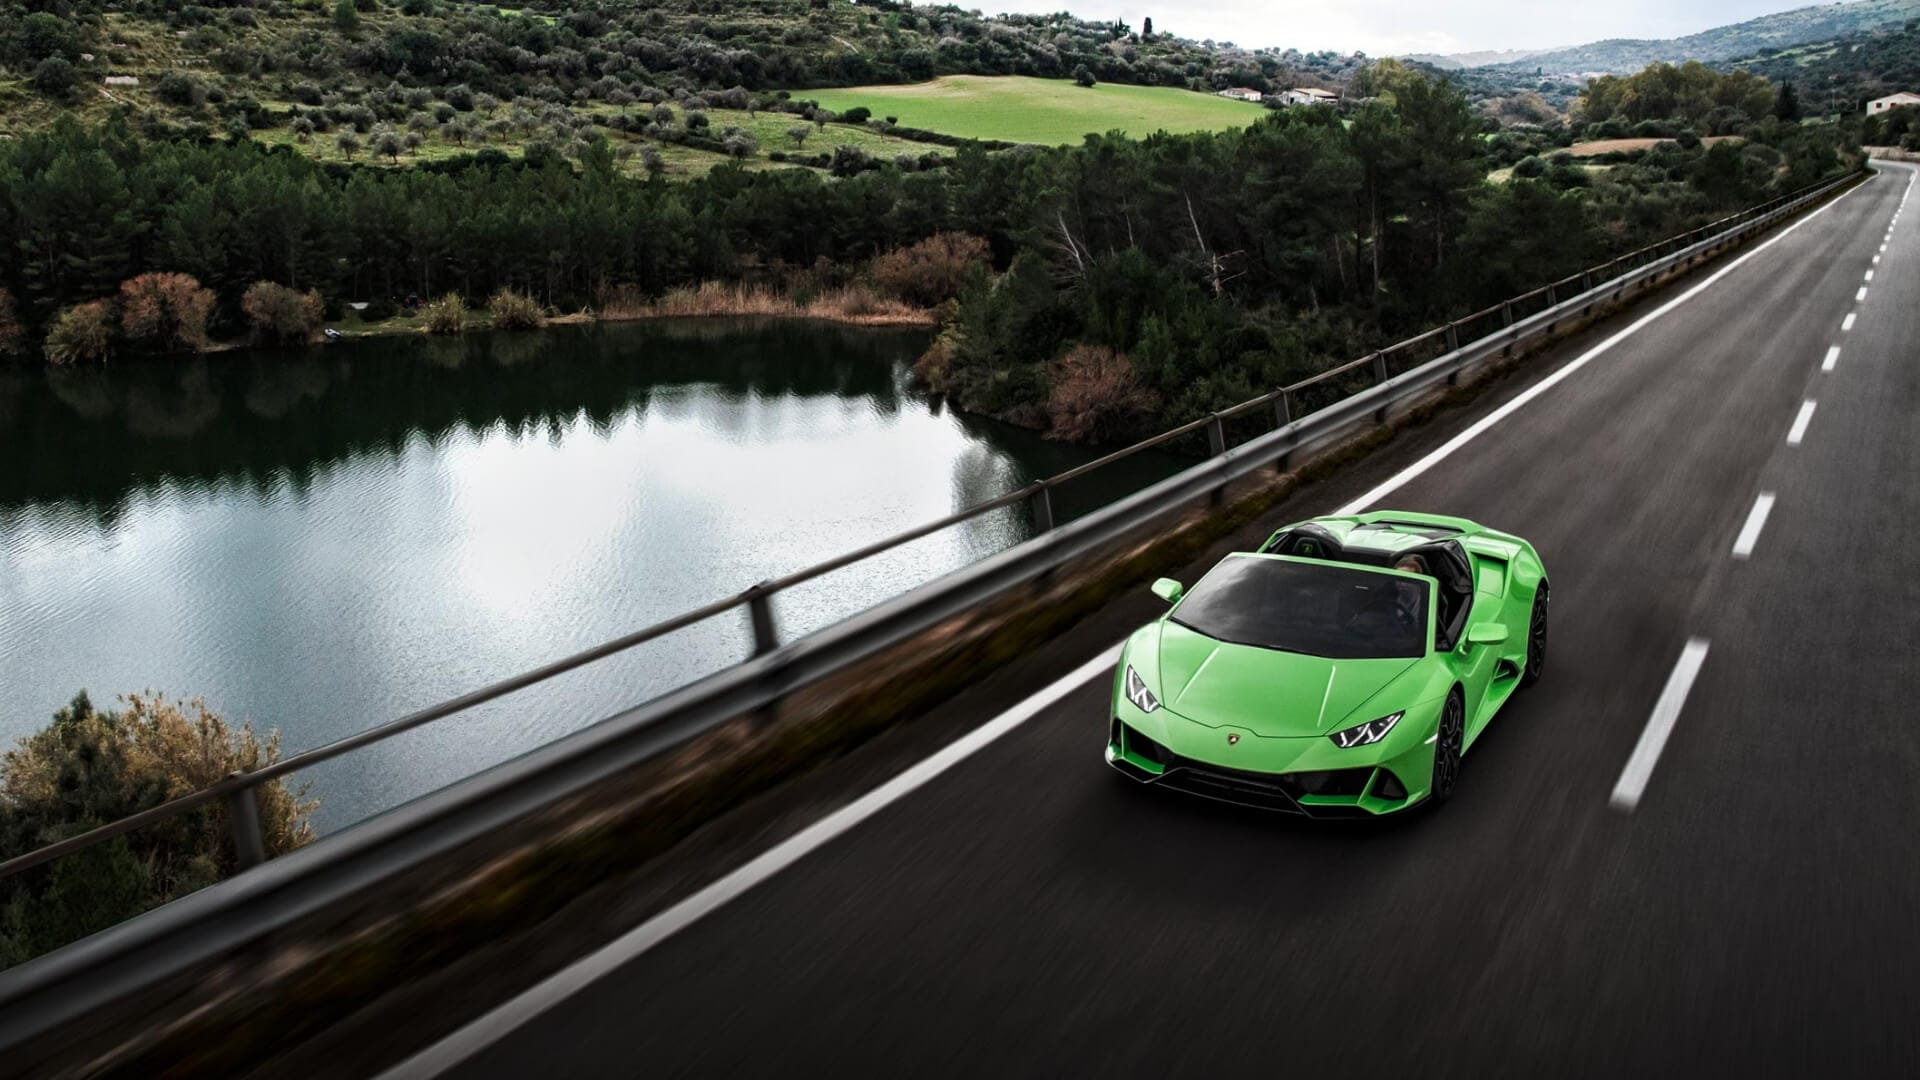 Real Carbon Fiber License Plate Frame for LAMBORGHINI Huracan Aventador Gallardo